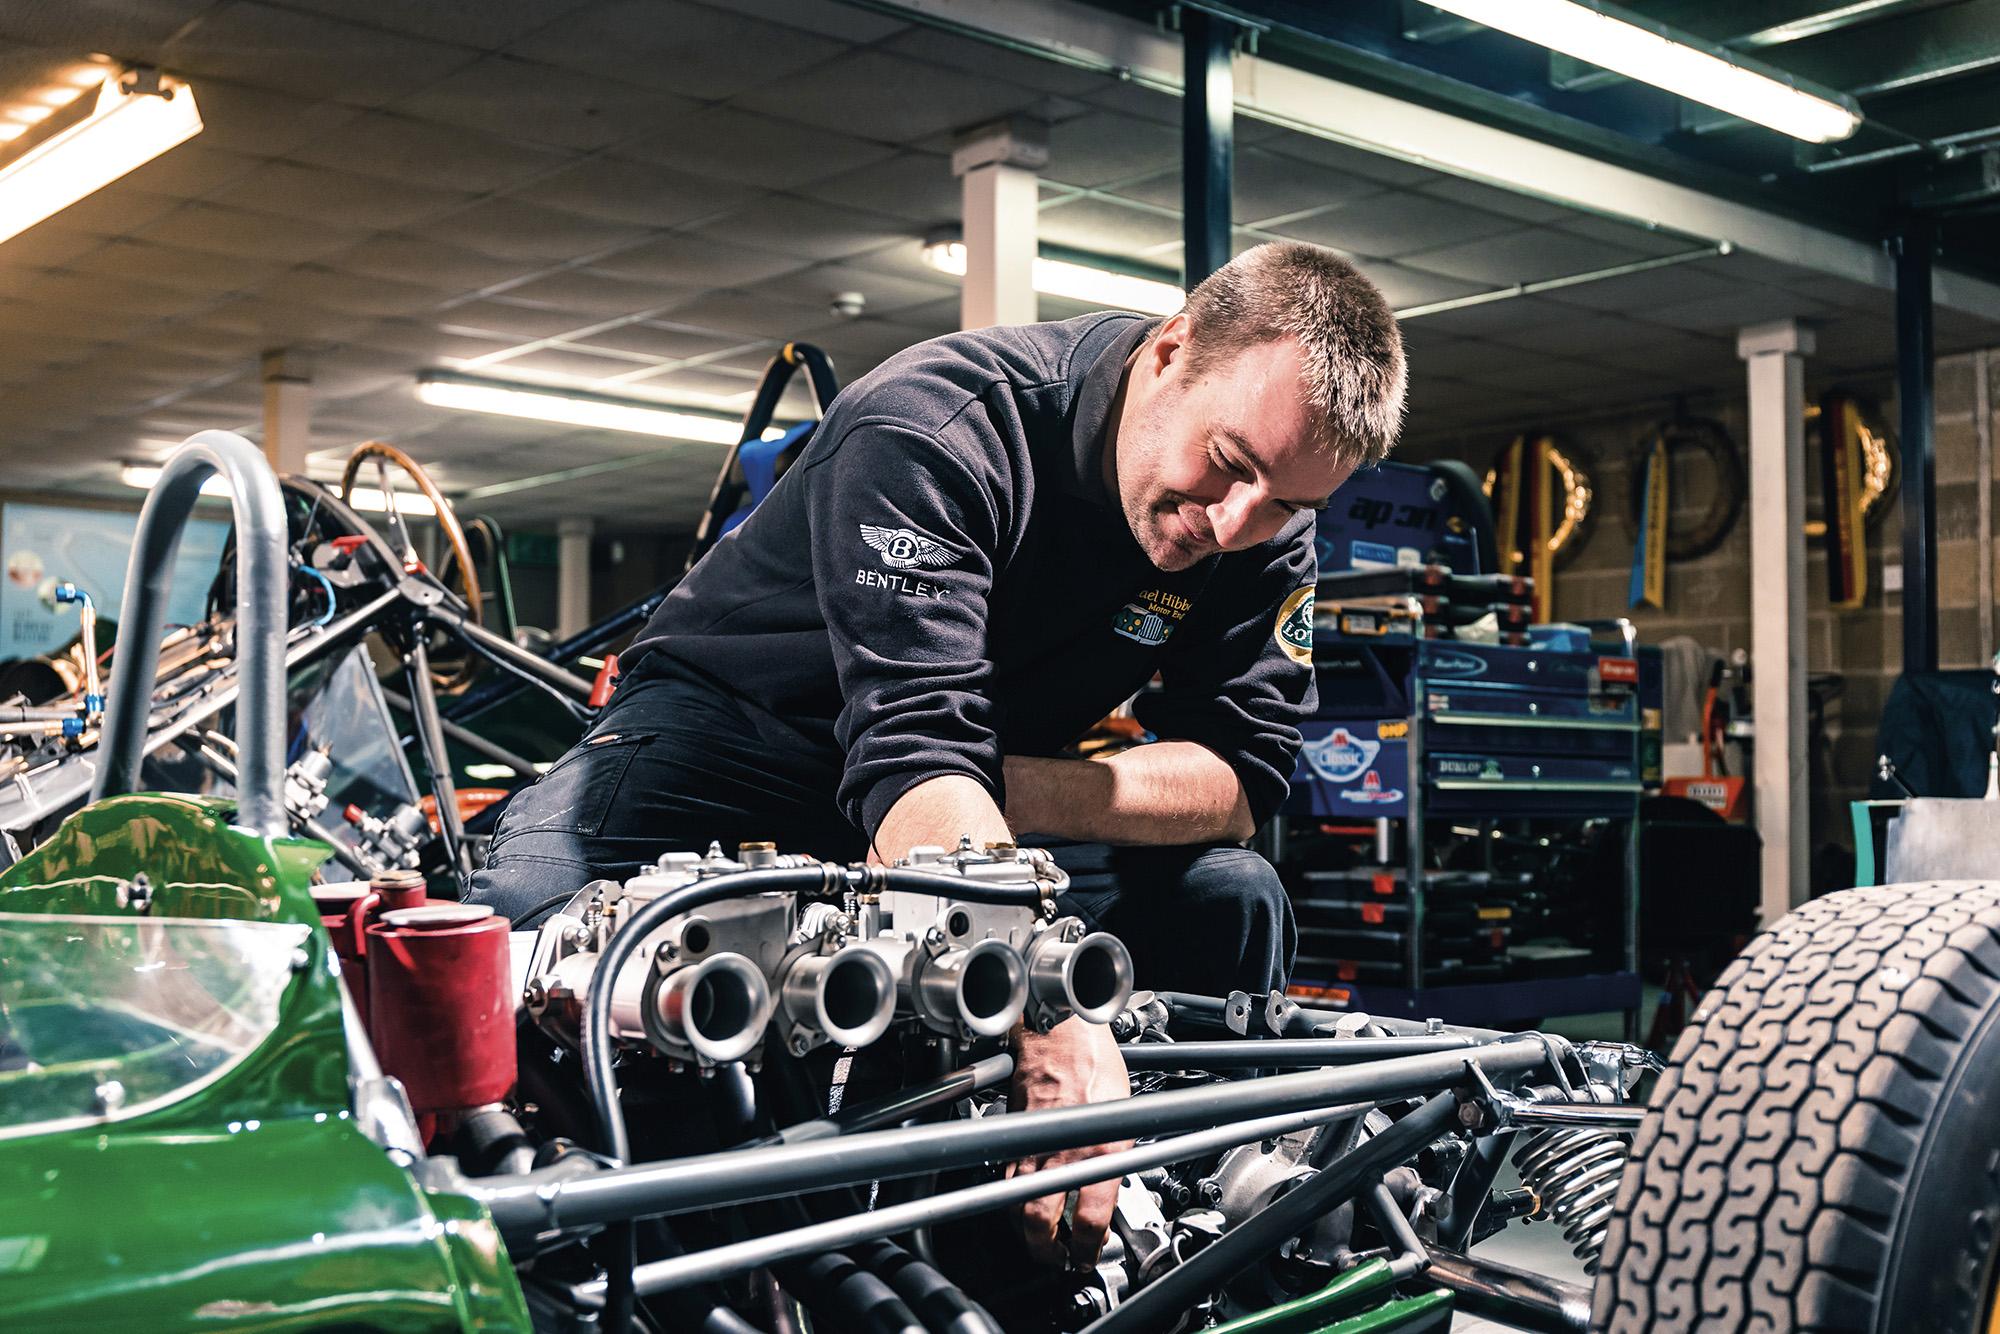 Lotus 22 mechanic